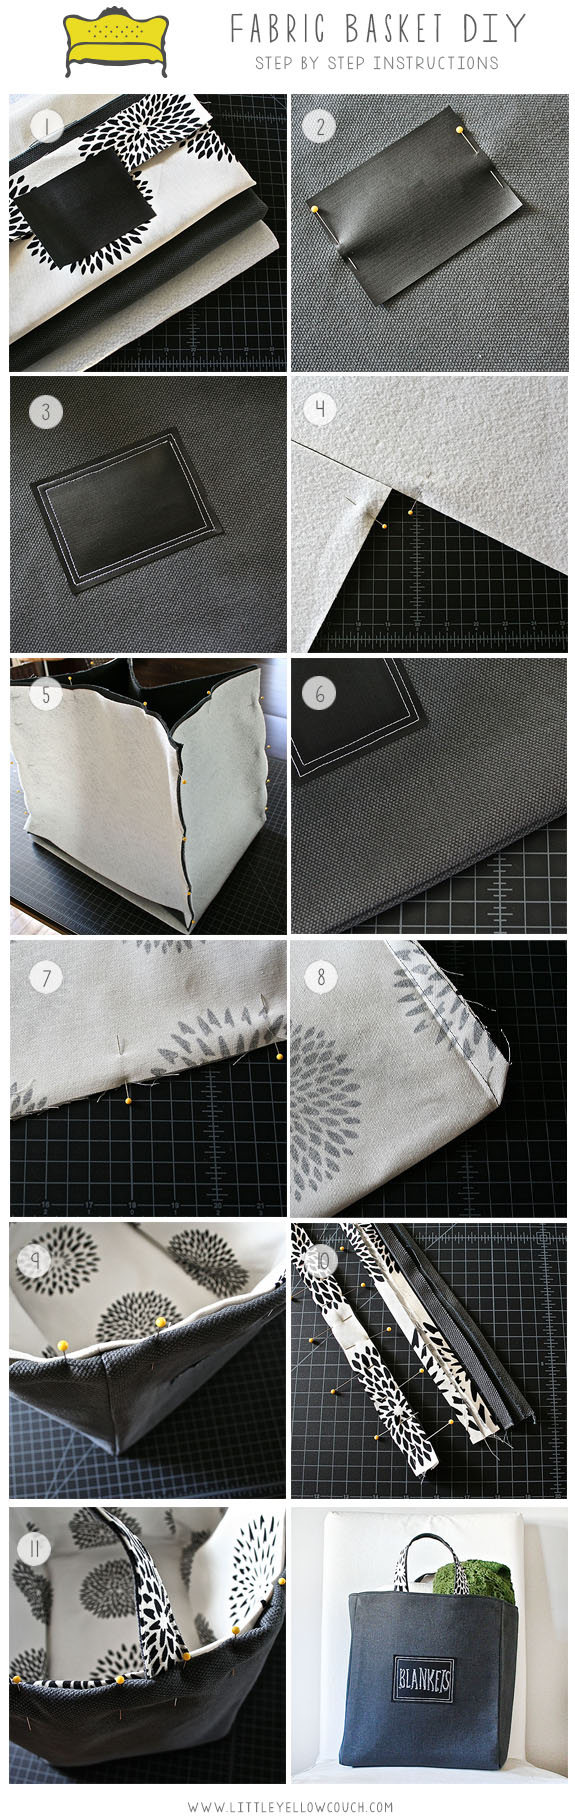 FabricBinDIY.jpg